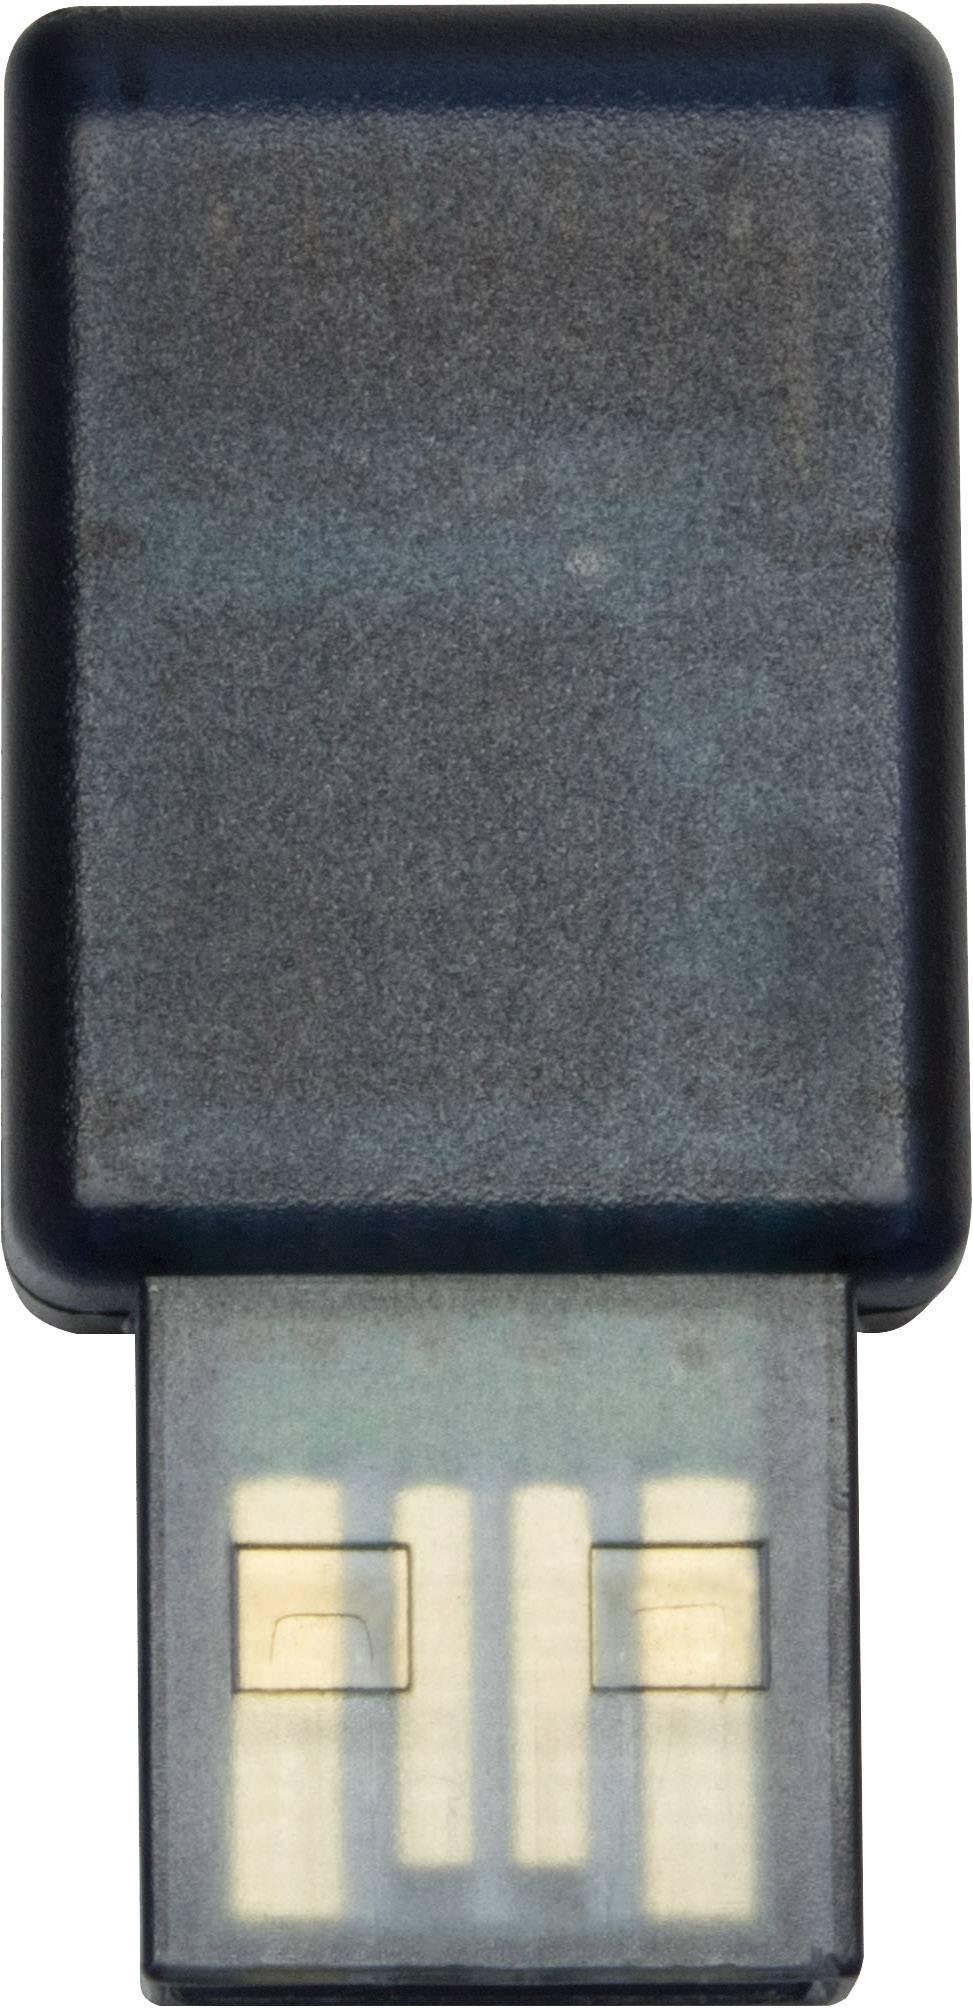 Rademacher DuoFern USB memory stick Z-Wave USB-Sti | Conrad com